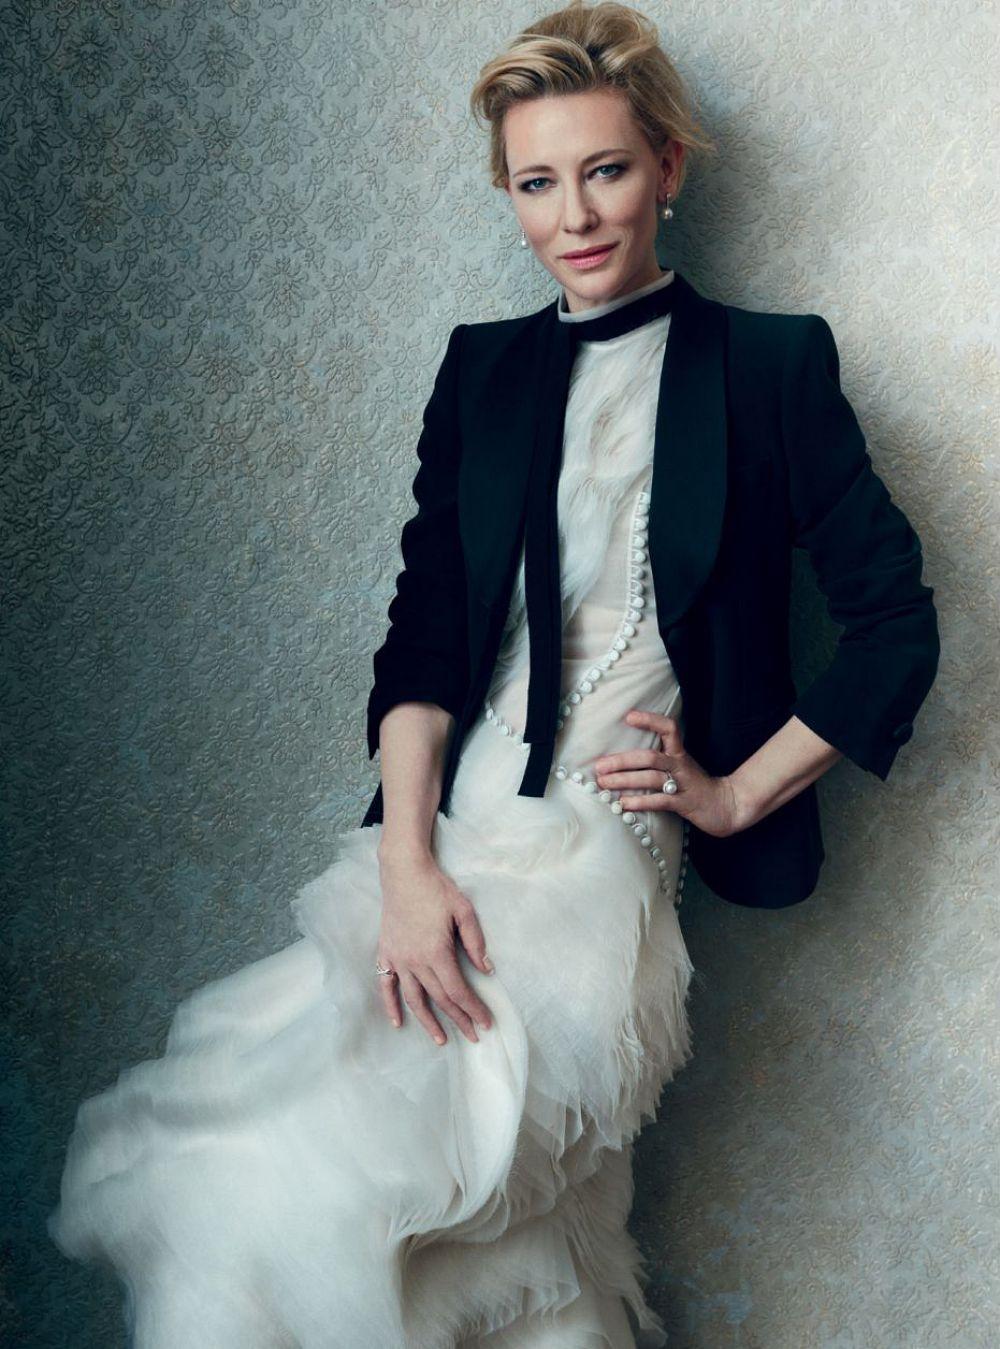 CATE BLANCHETT in Harper's Bazaar Magazine, February 2016 ... Cate Blanchett 2016